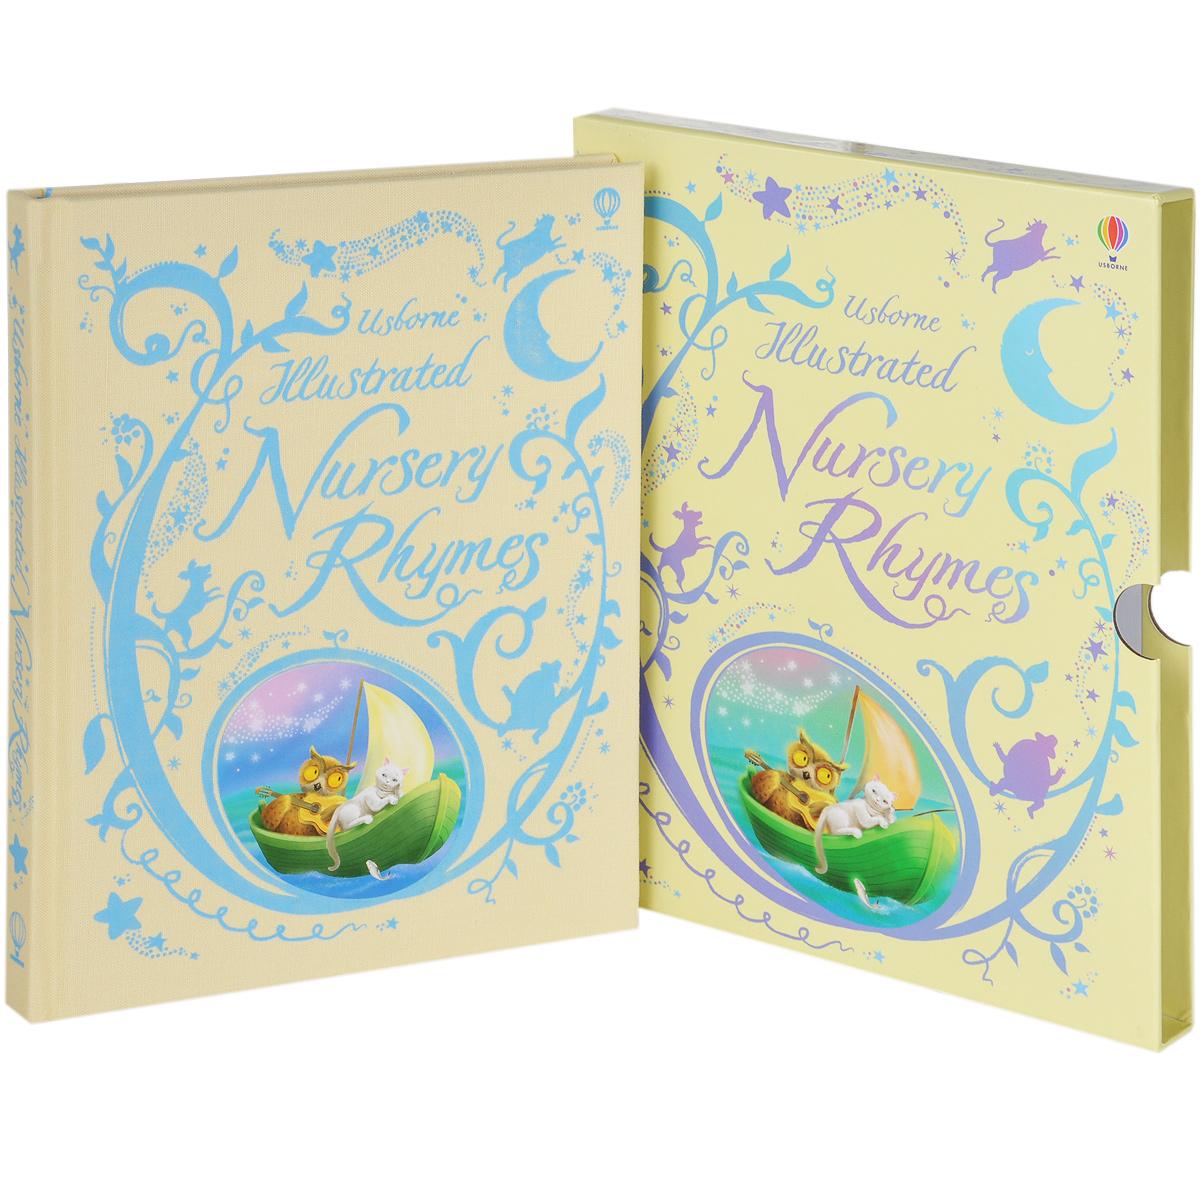 Illustrated Nursery Rhymes maisy goes to nursery